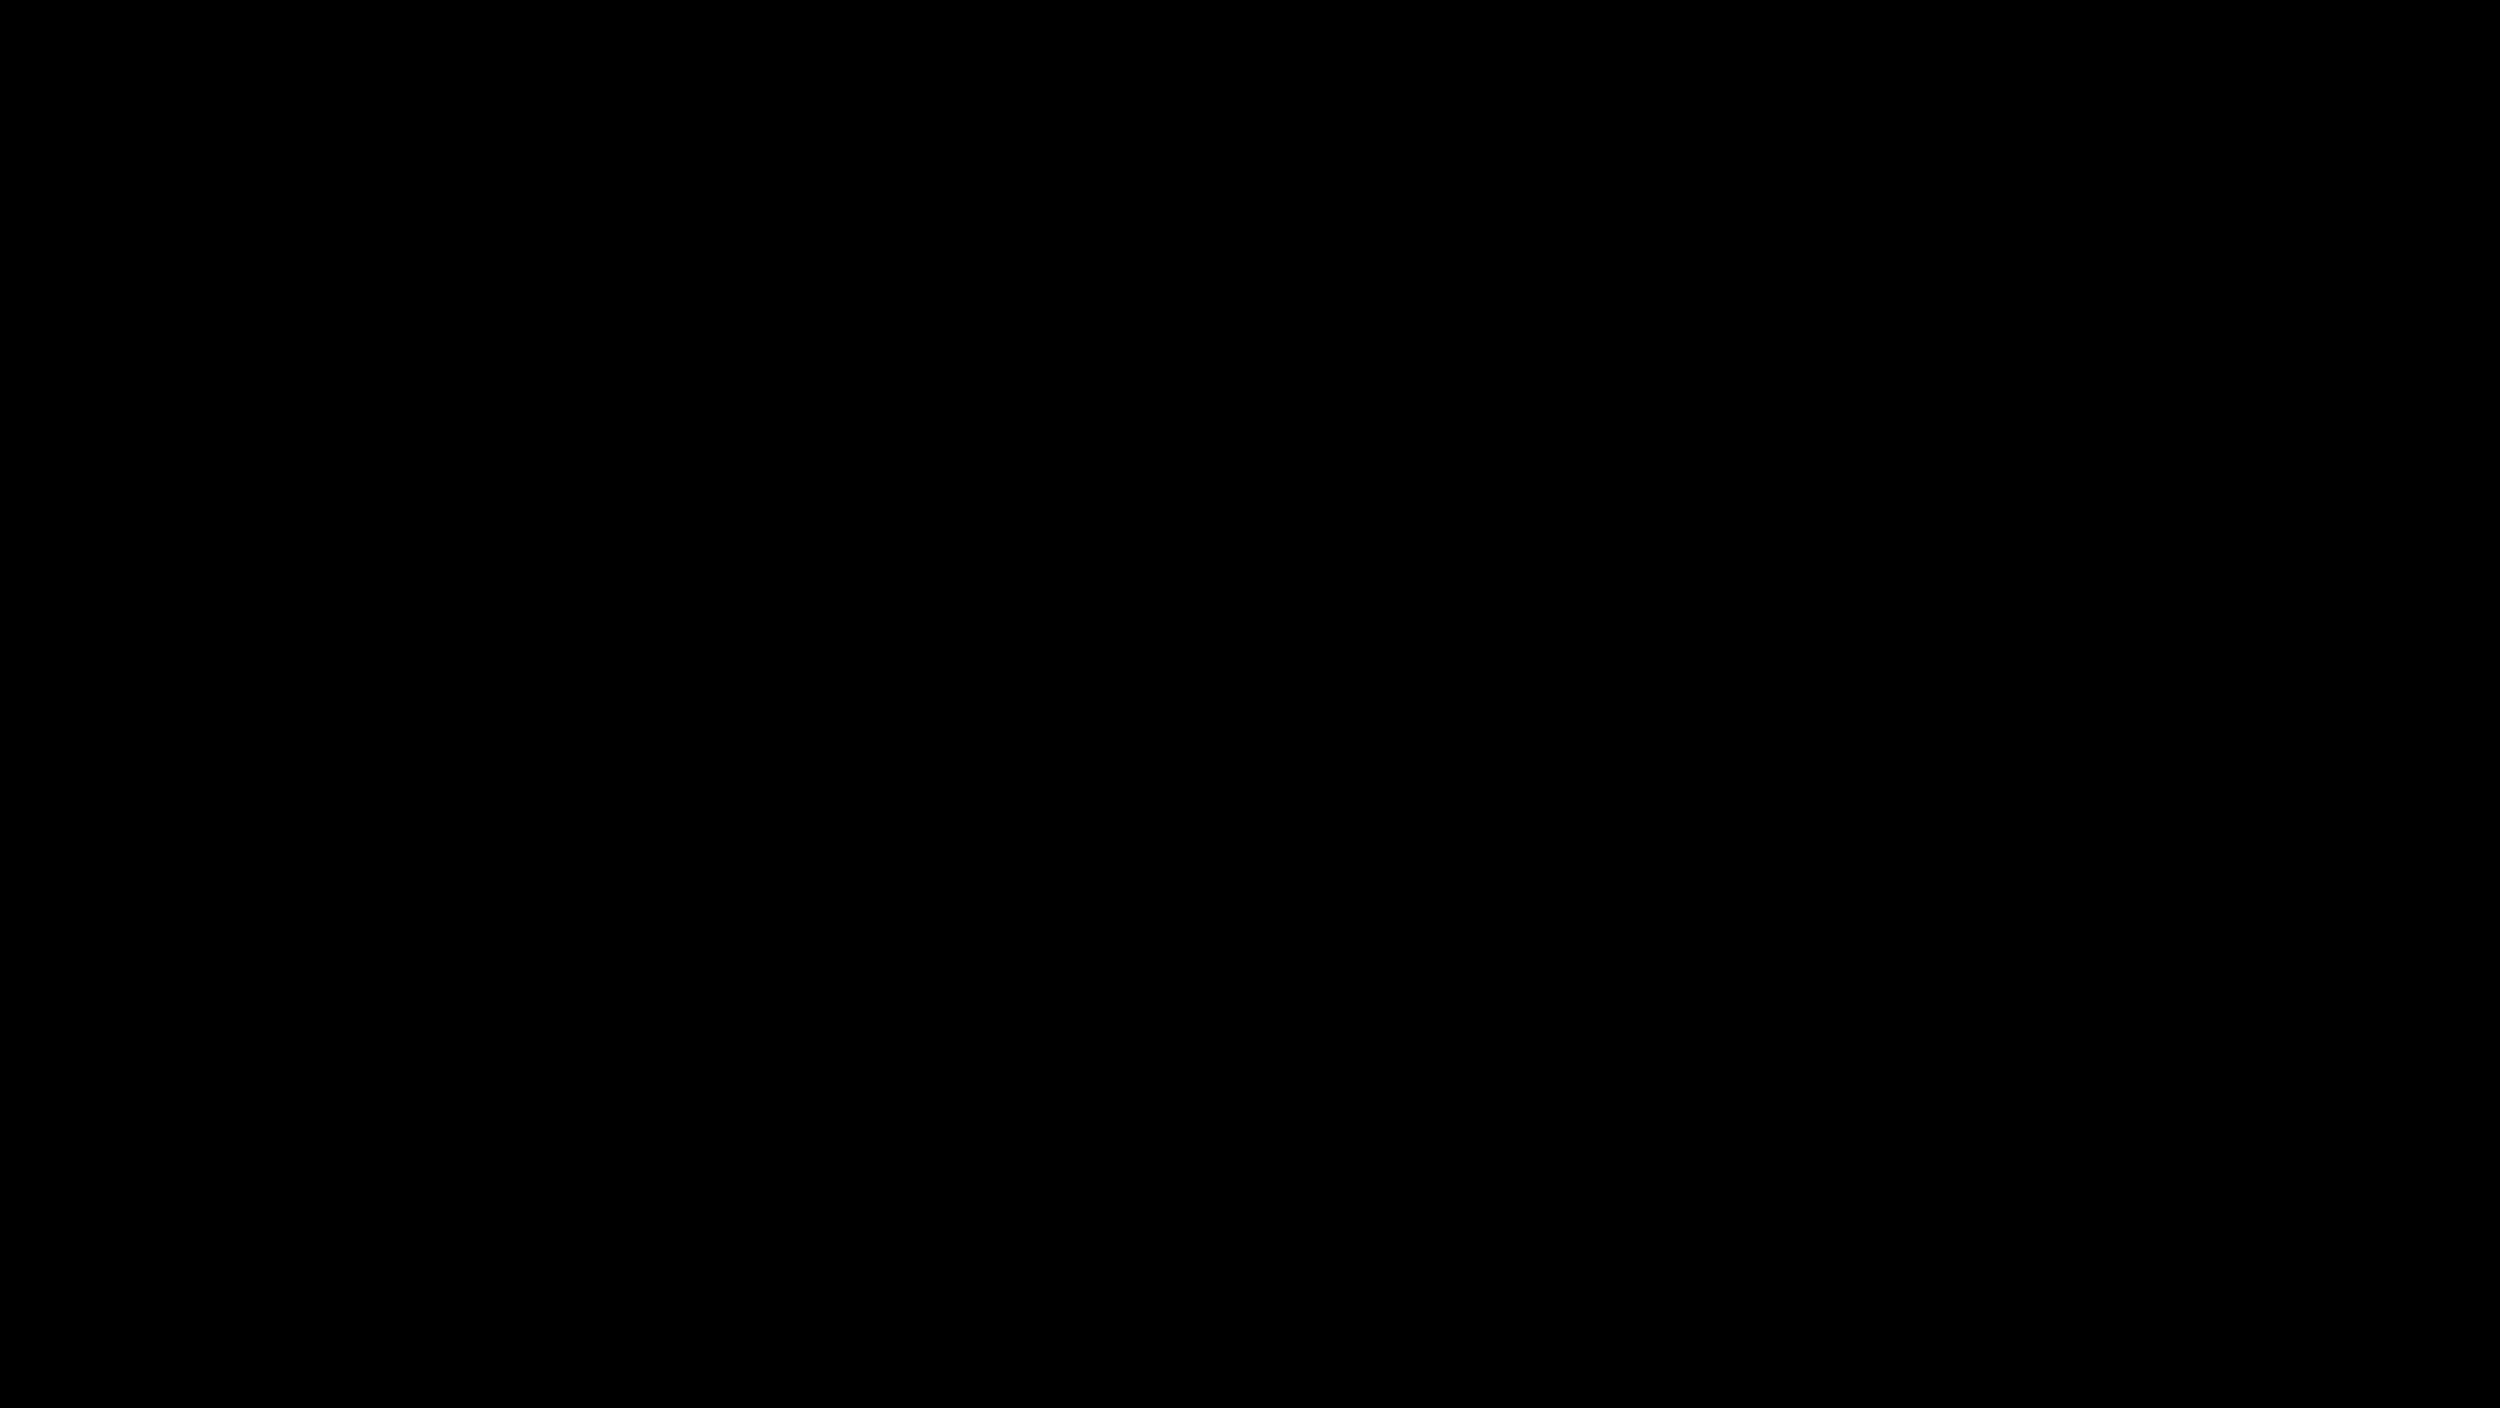 Sherekahnn-Logo-PNG_Black_Transparent.png